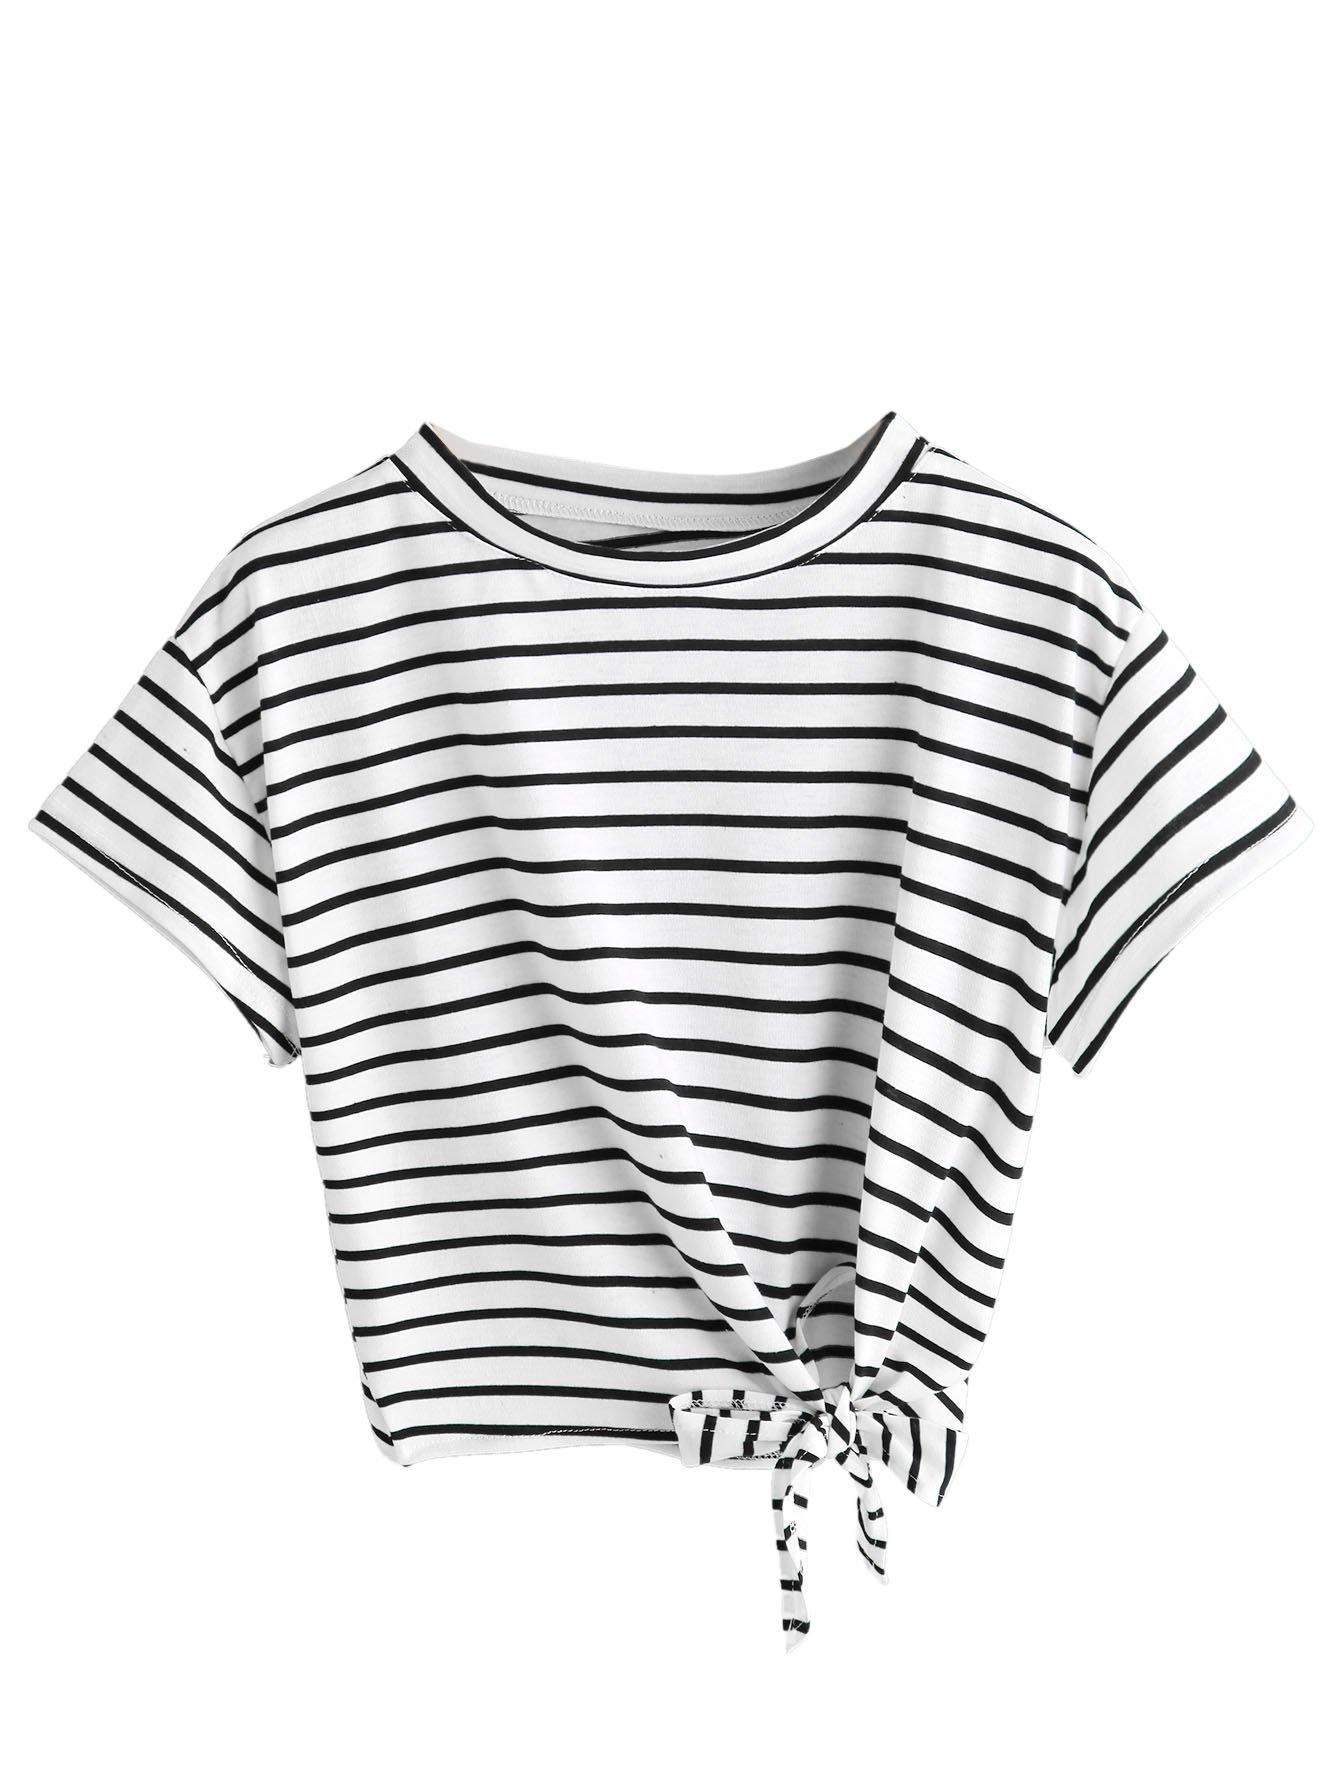 SweatyRocks Women's Loose Short Sleeve Summer Crop T-shirt Tops Blouse White Black S